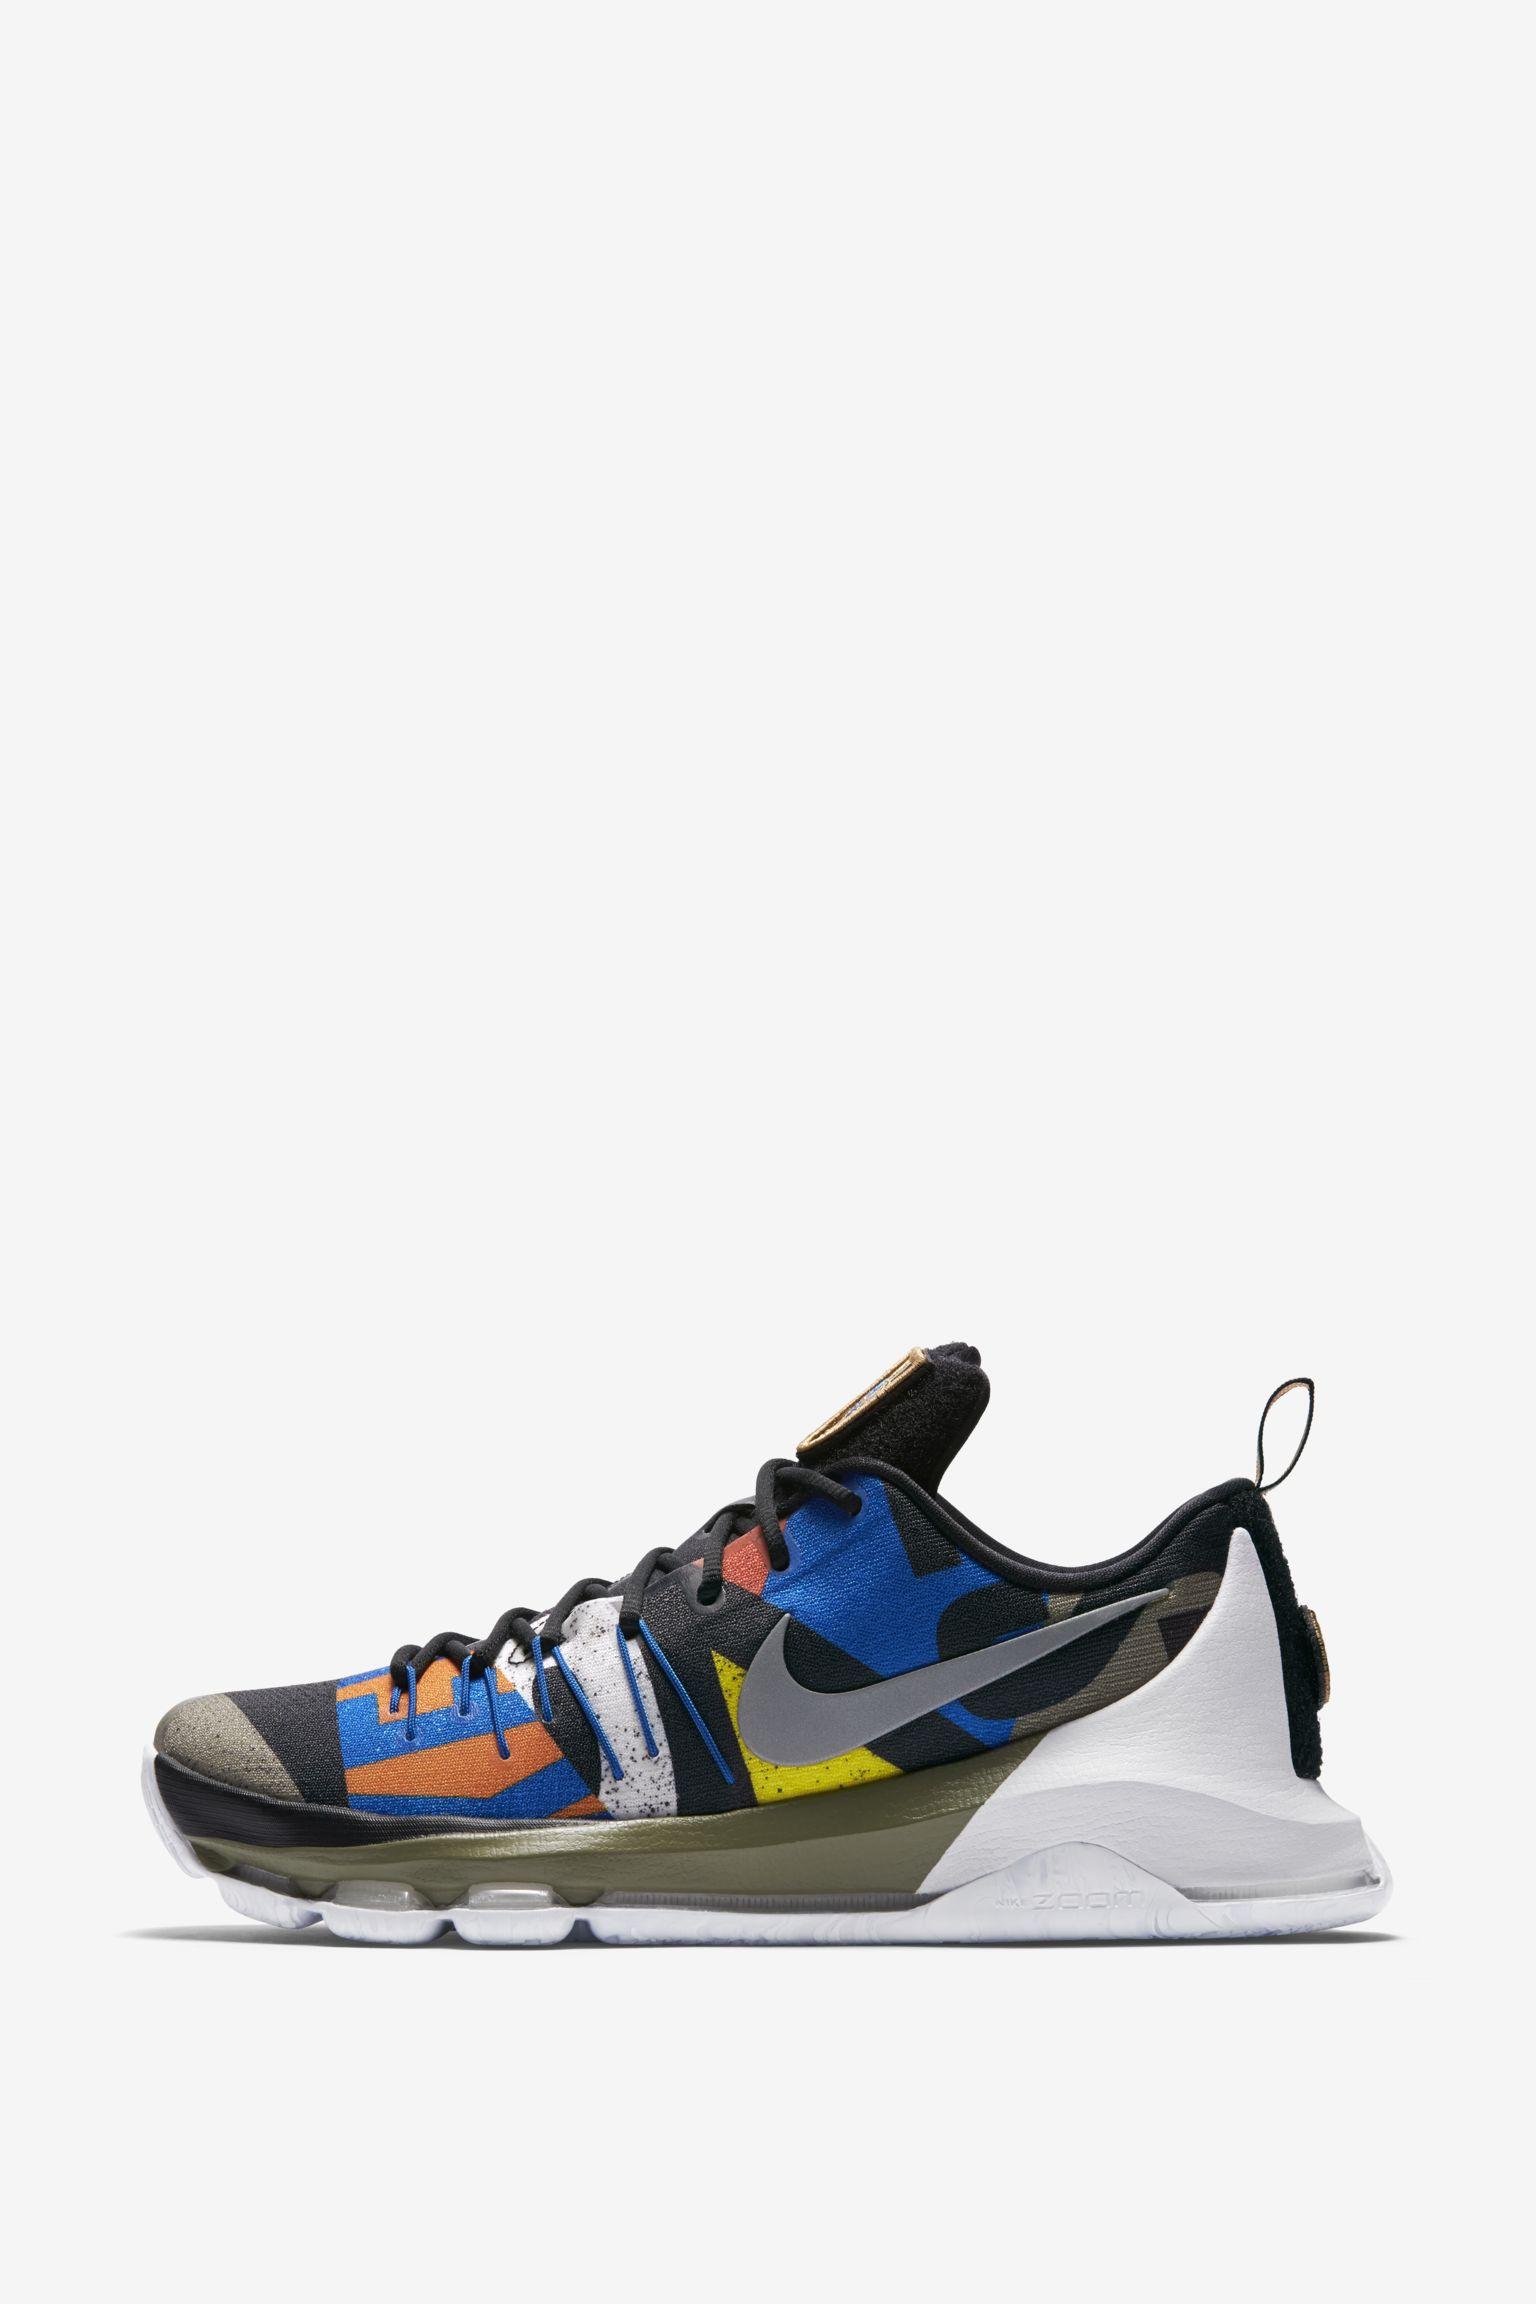 fd3154ac1449 KD 8 Premium gs  Nike KD 8 All Star Release Date Nike+ SNKRS ...